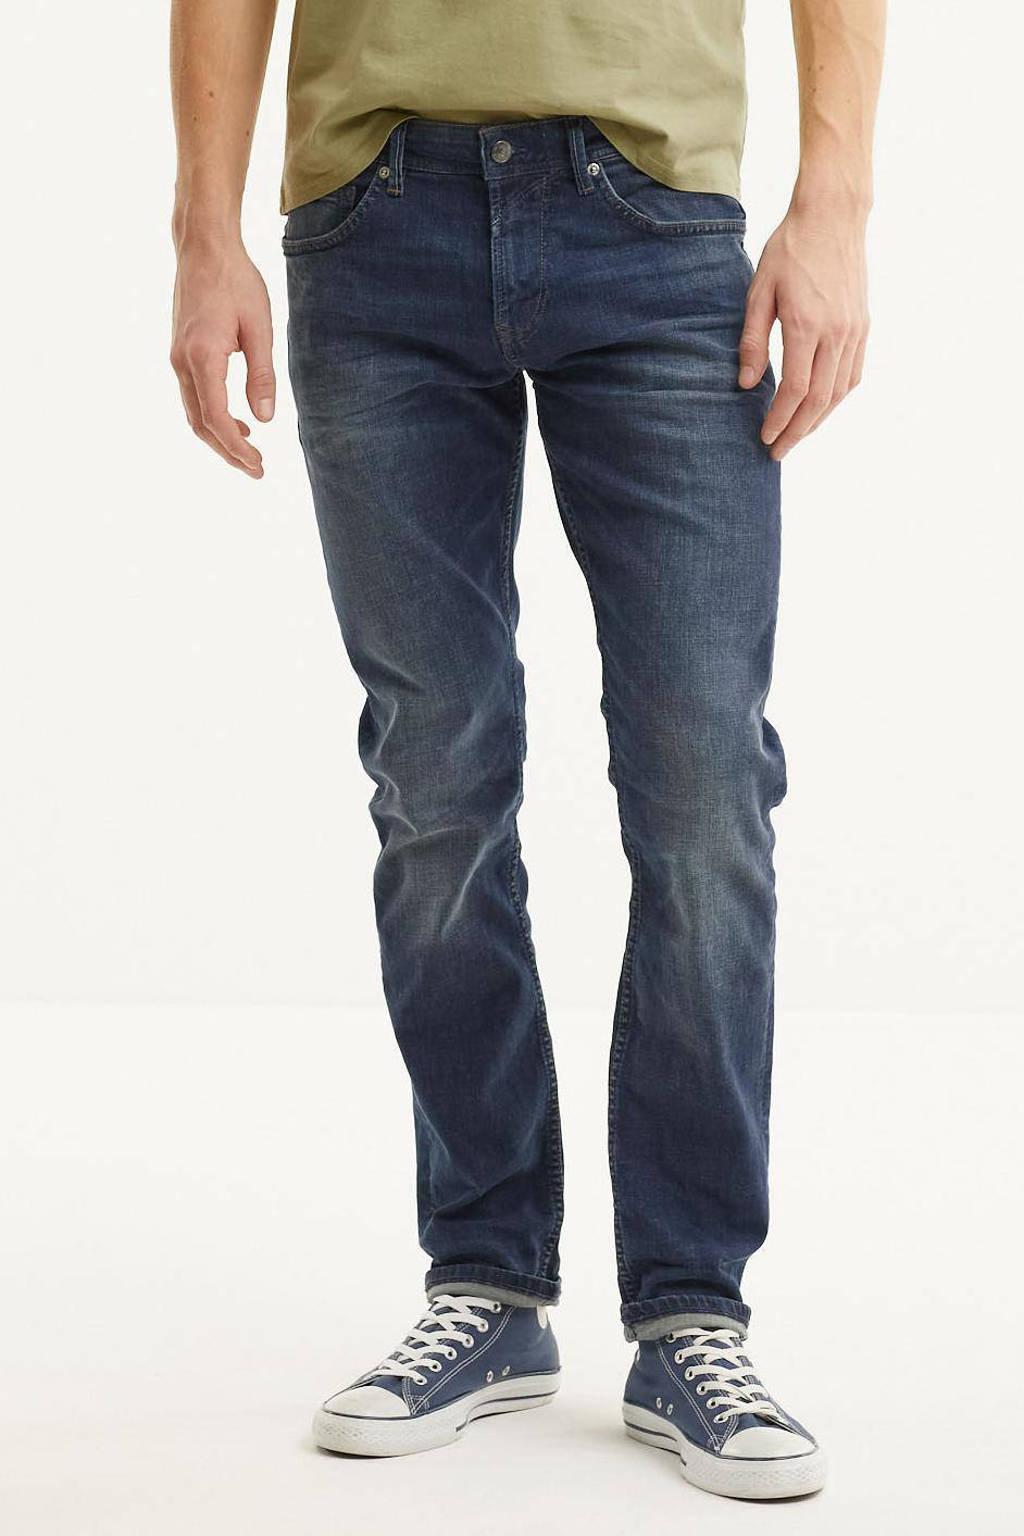 Tom Tailor slim fit jeans Piers dark stone wash denim, 10282 dark stone wash denim